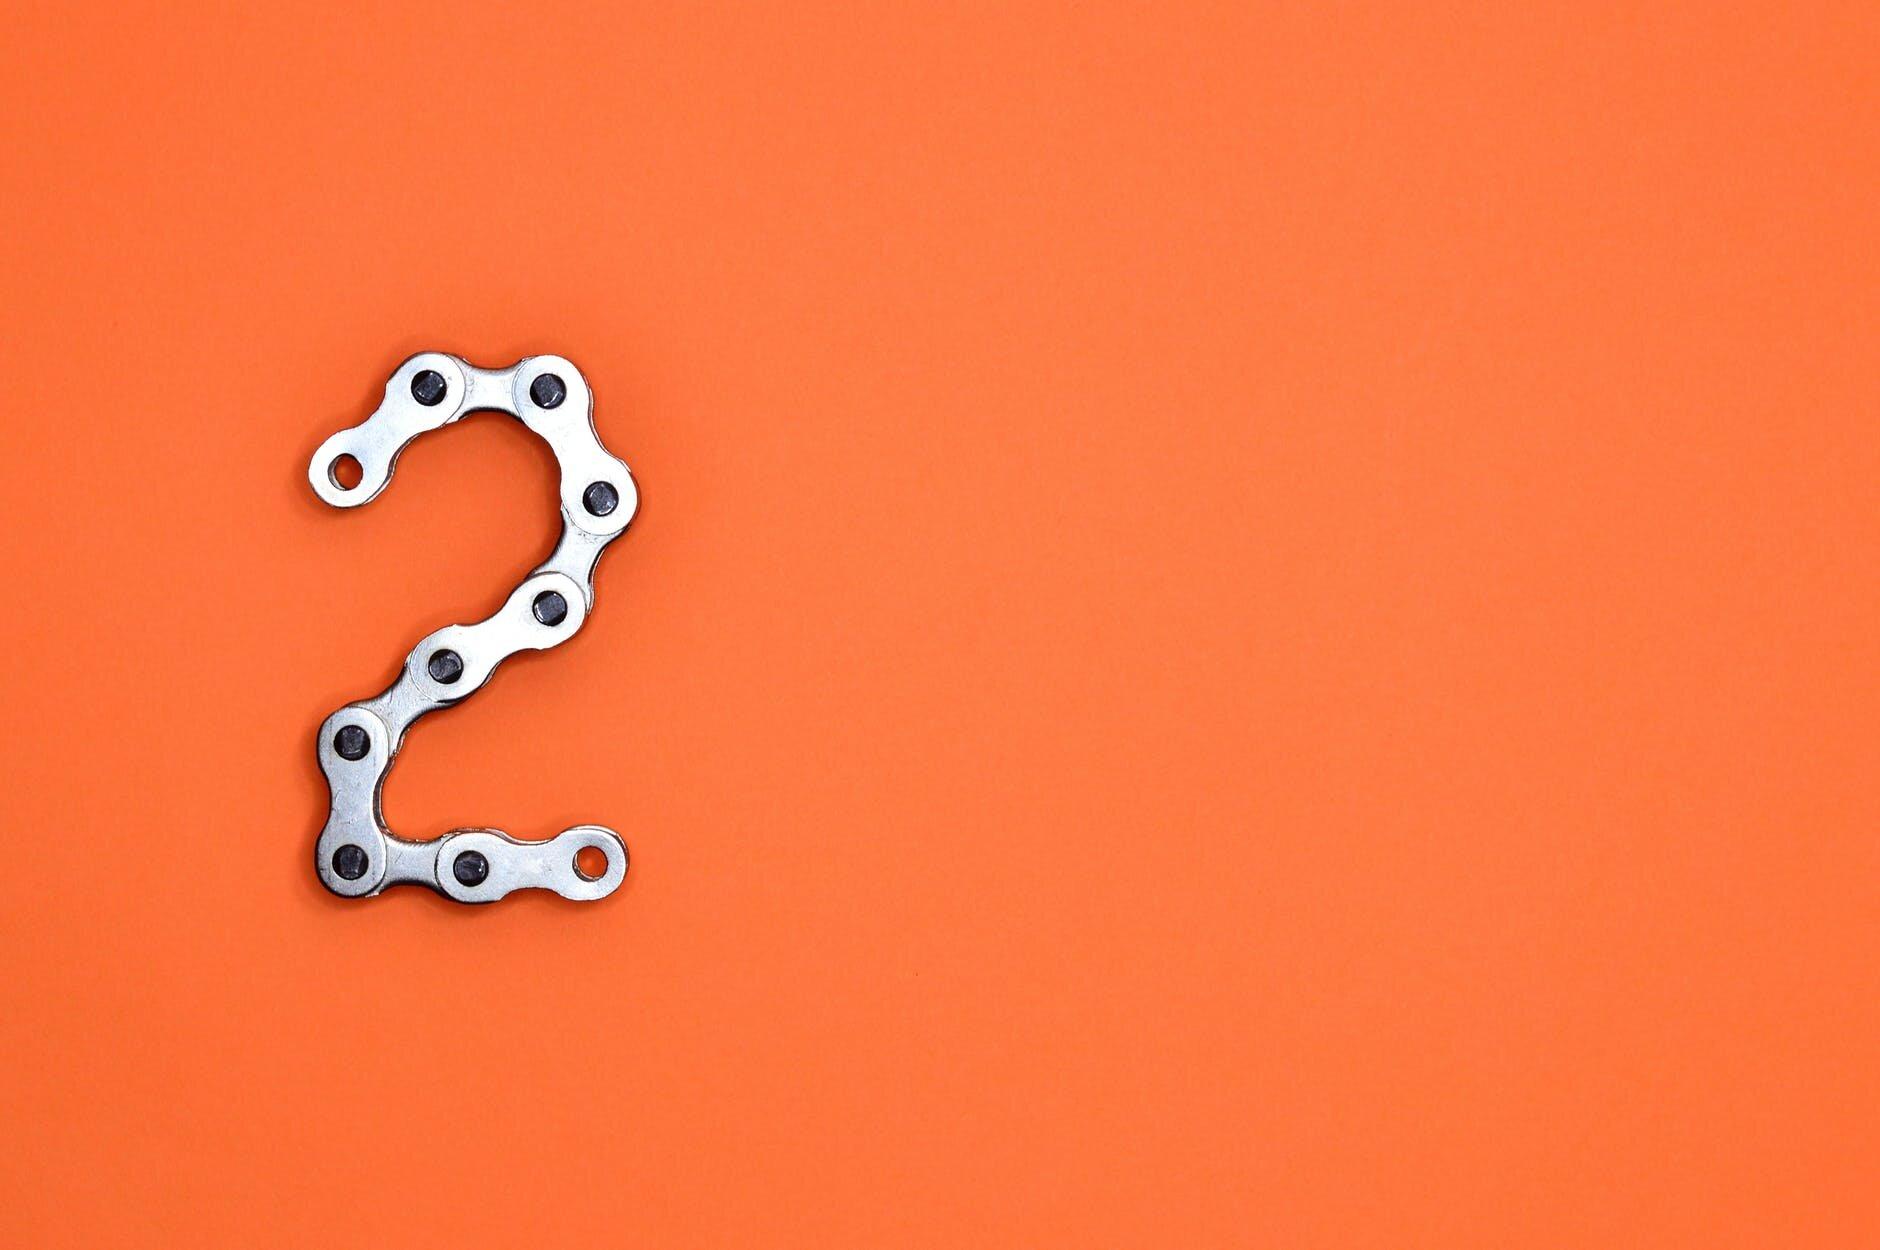 gray steel chain on orange surface